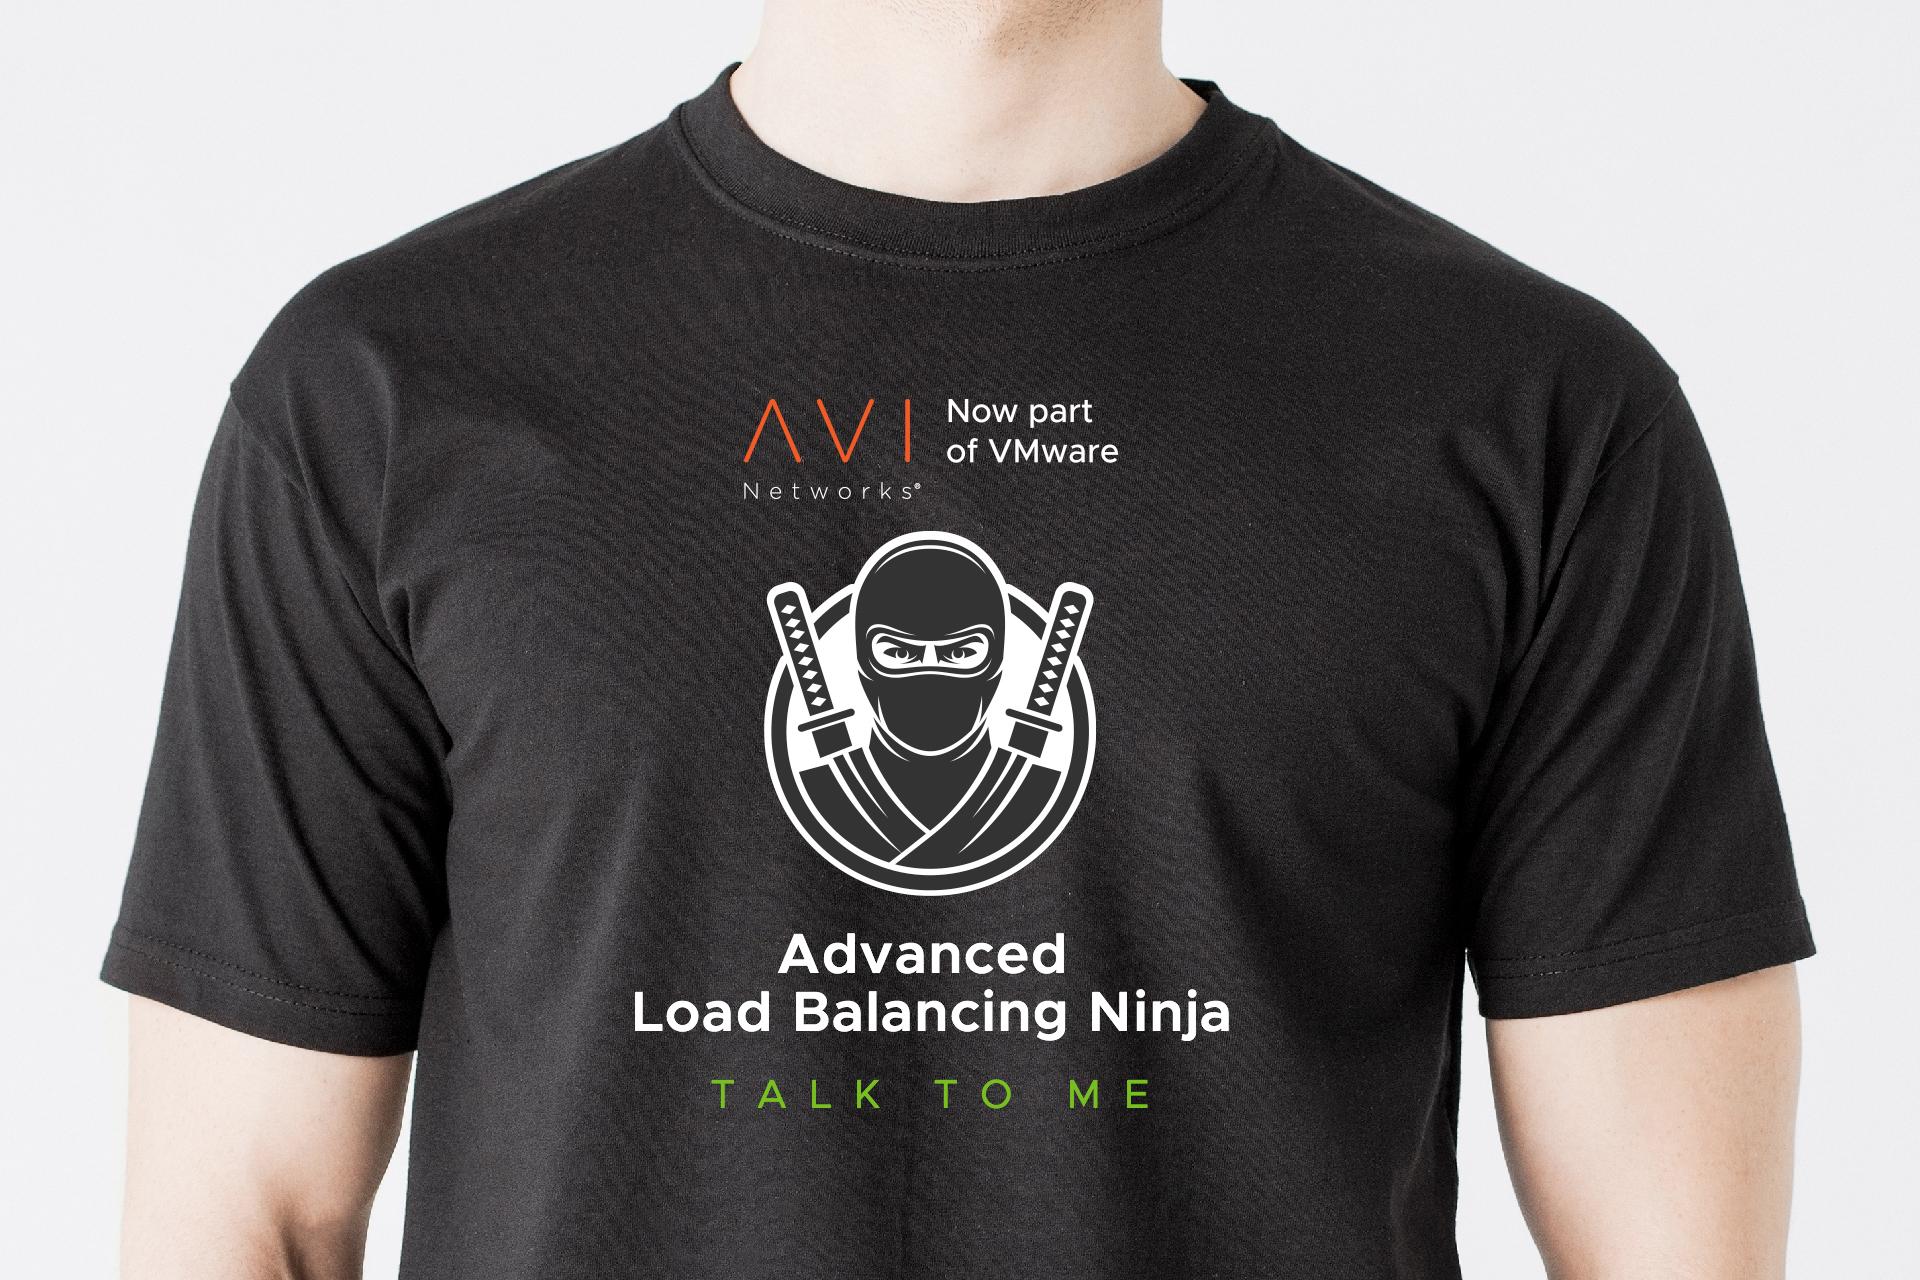 Avi Networks Event Staff T-shirt